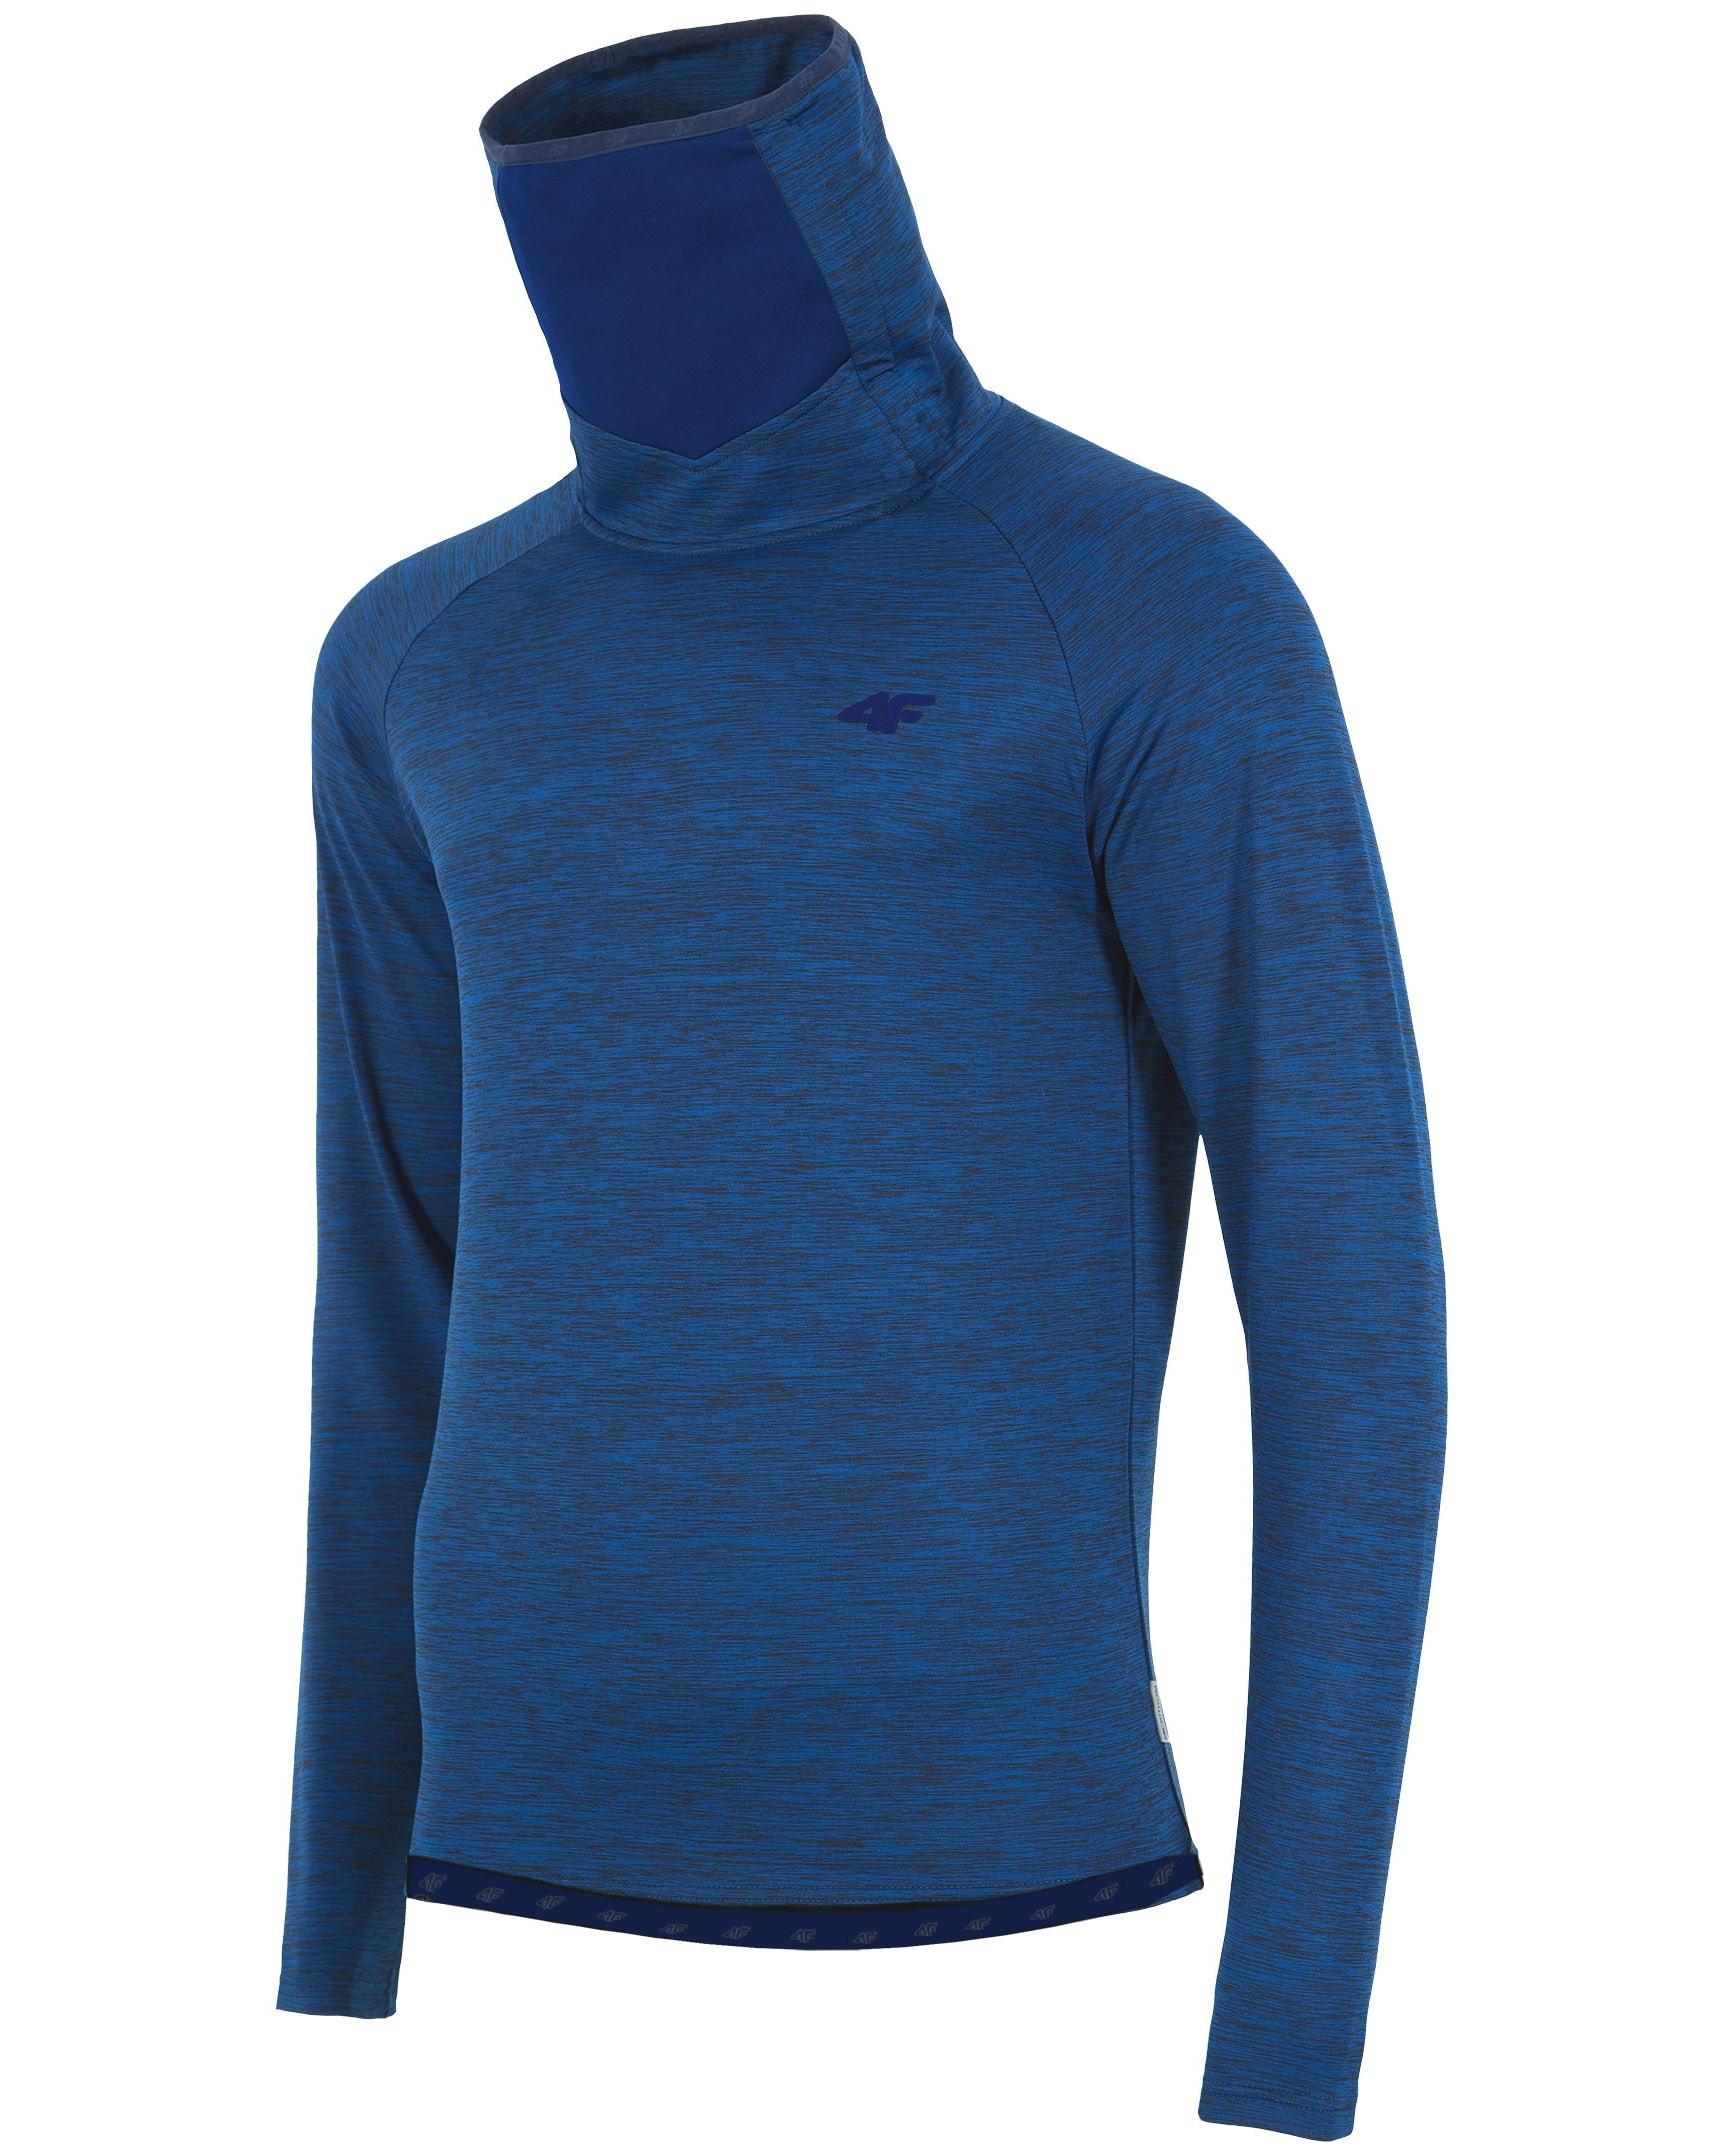 4F Knitwear Unerwear (Rib) - Navy Melange